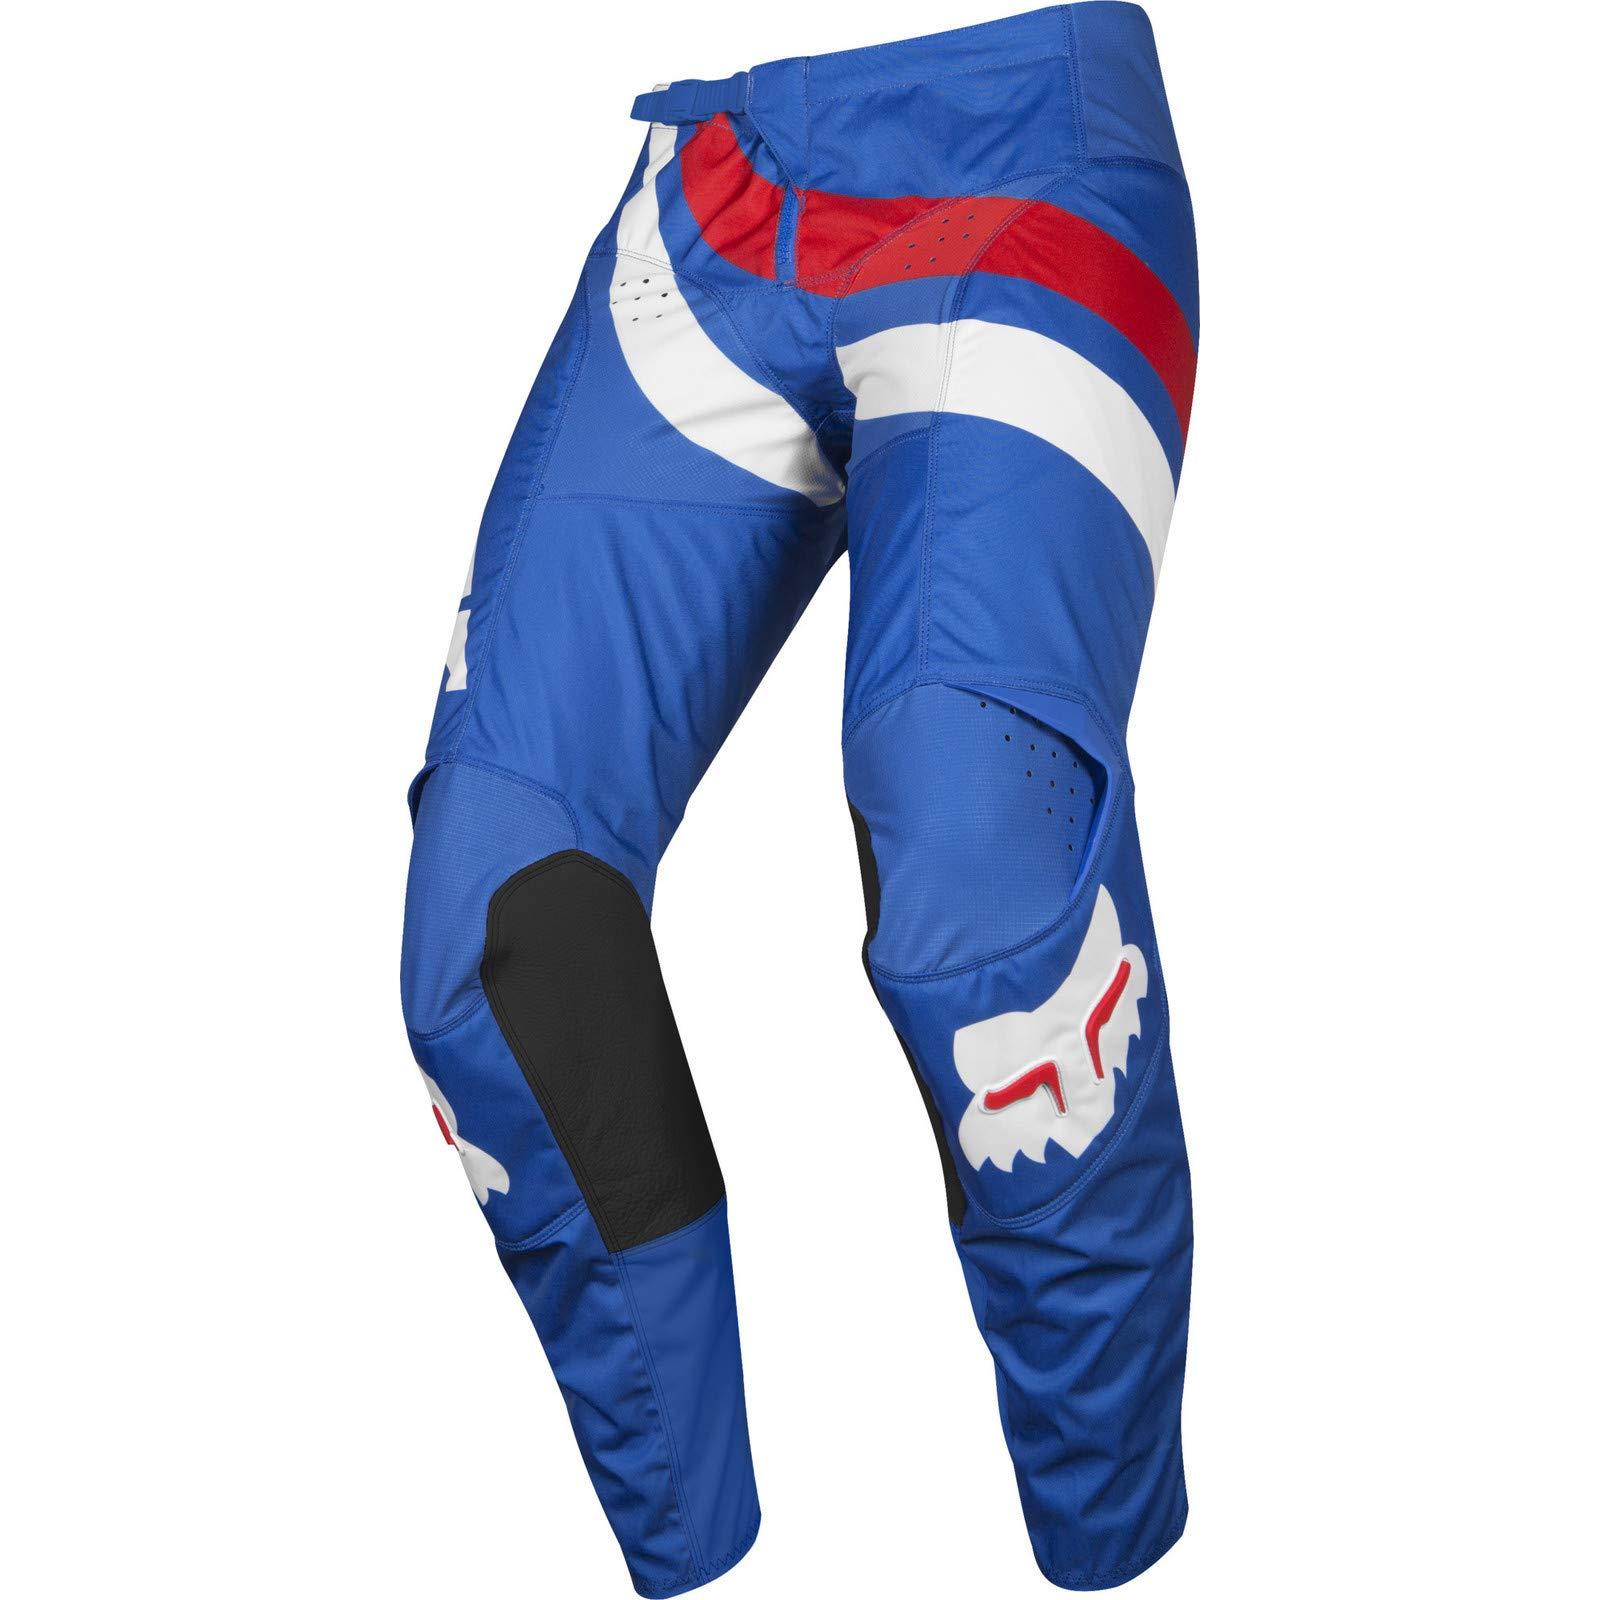 2019 Fox Racing Youth 180 Cota Pants-Red-24